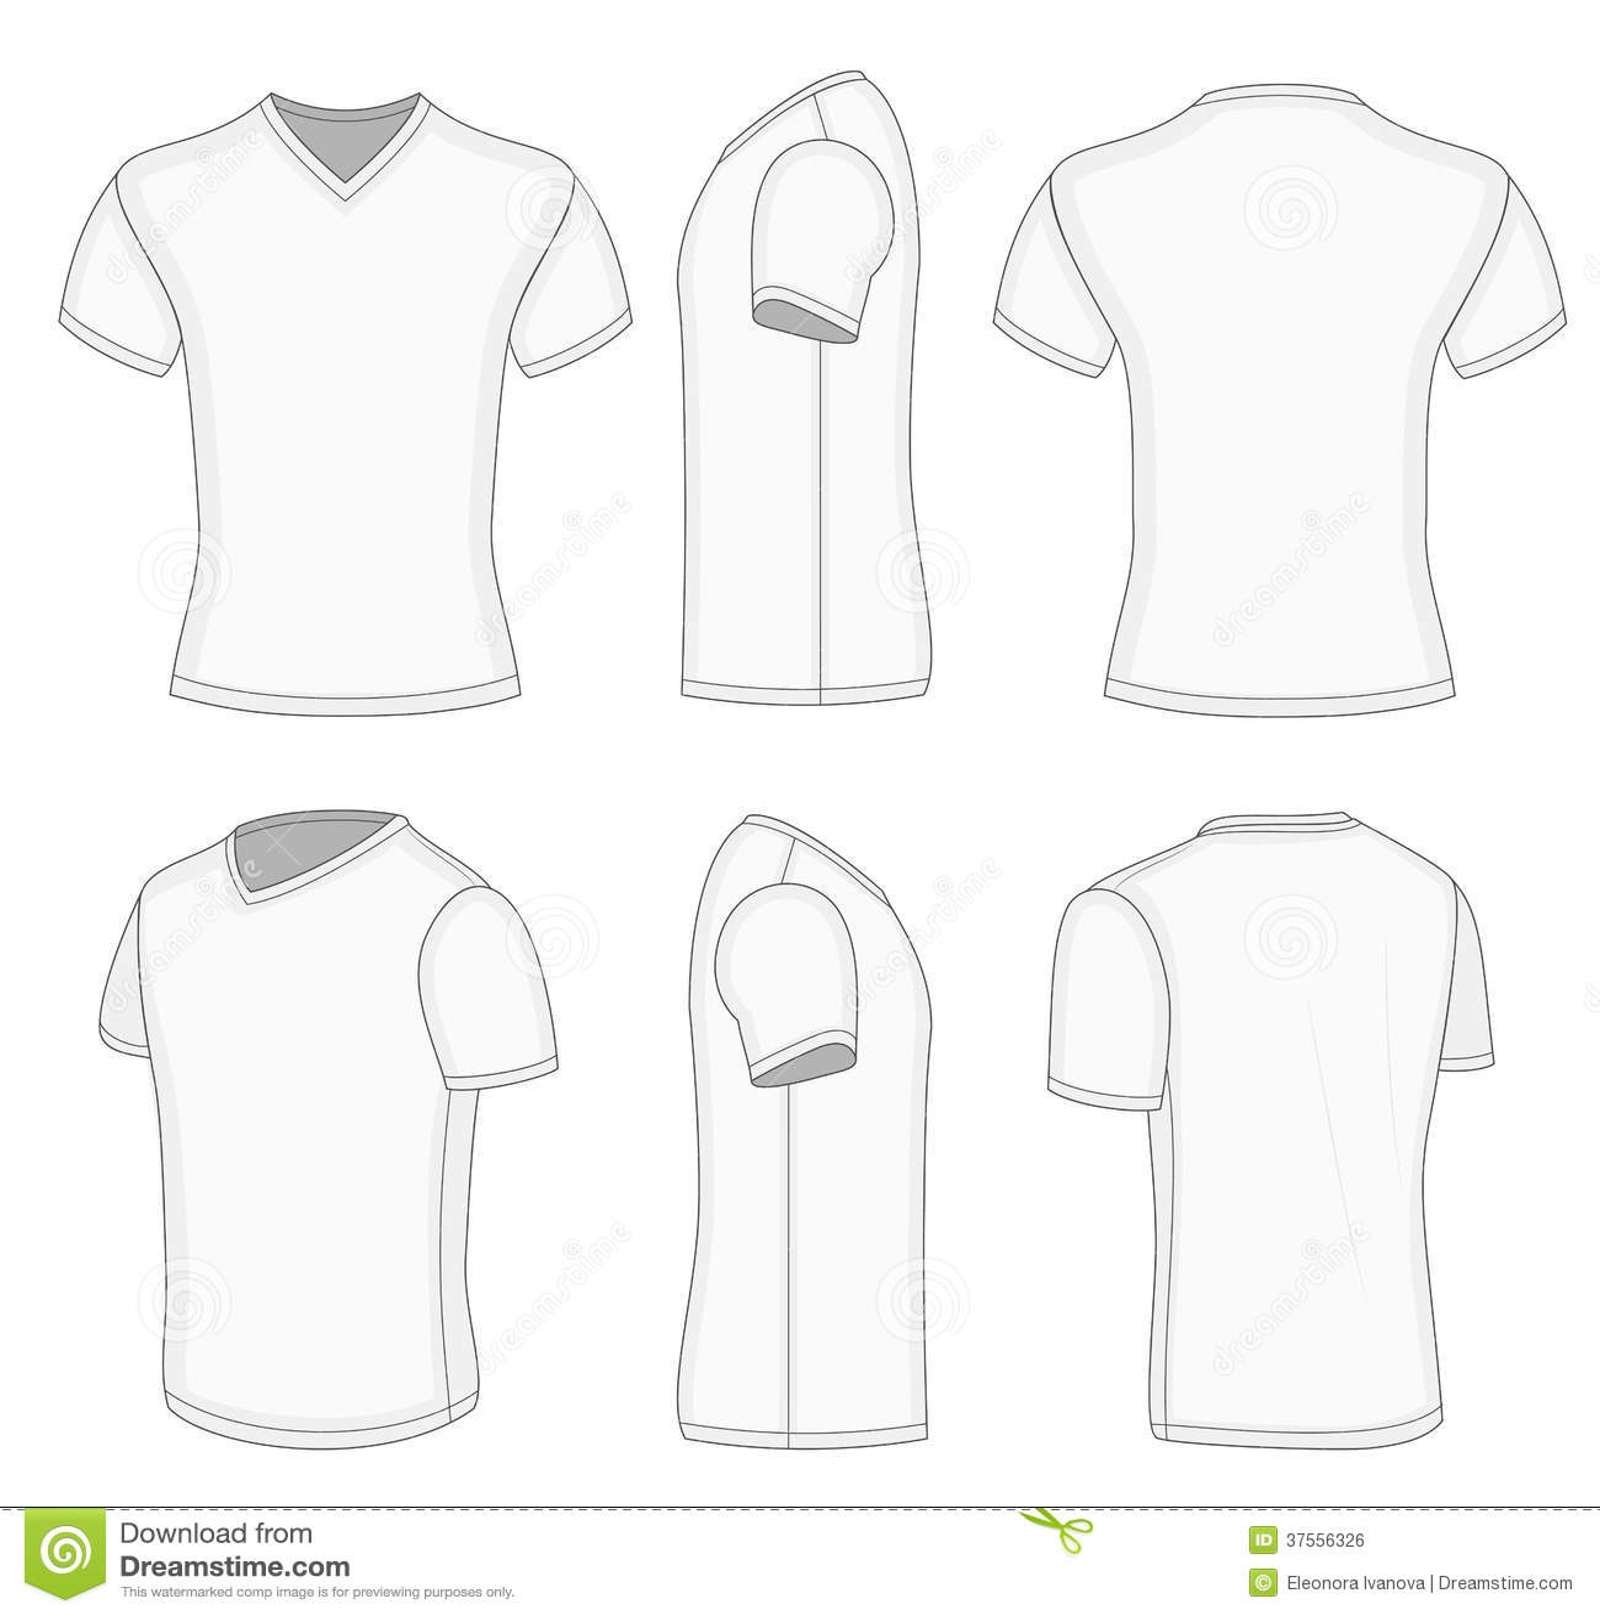 all views men 39 s white short sleeve v neck t shirt stock vector illustration of wear view. Black Bedroom Furniture Sets. Home Design Ideas